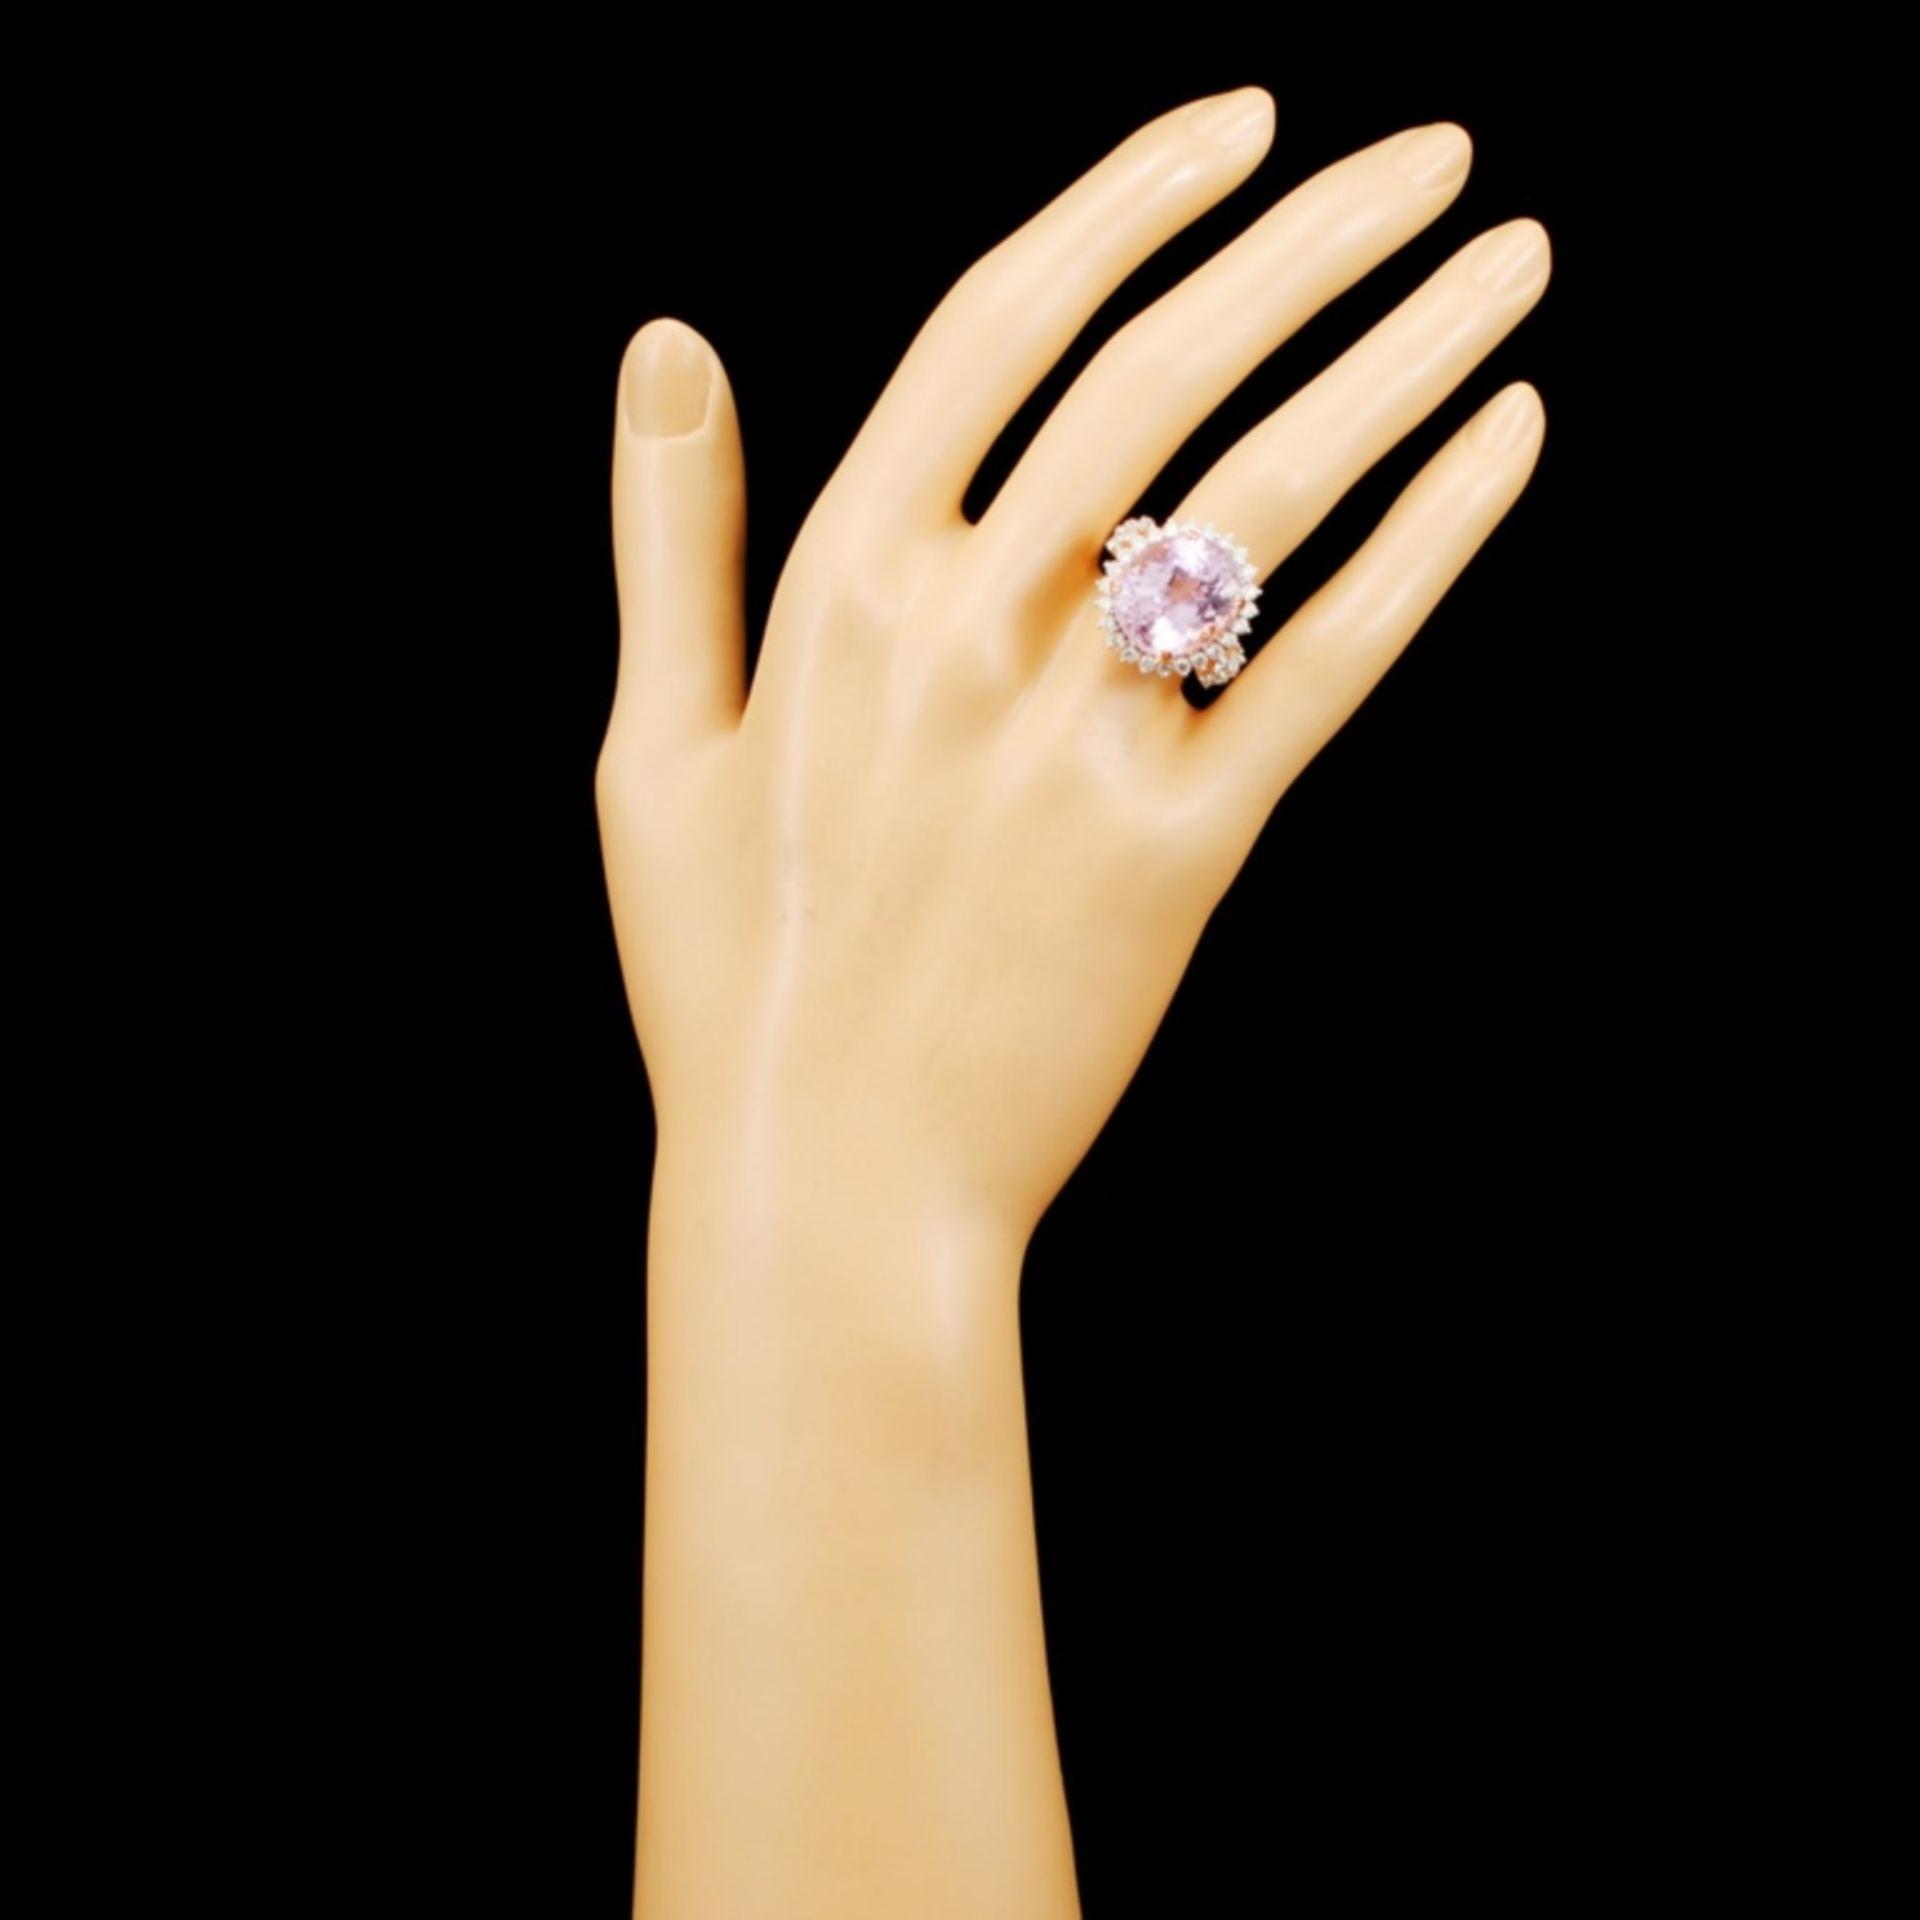 14K Gold 17.00ct Kunzite & 1.32ctw Diamond Ring - Image 4 of 5